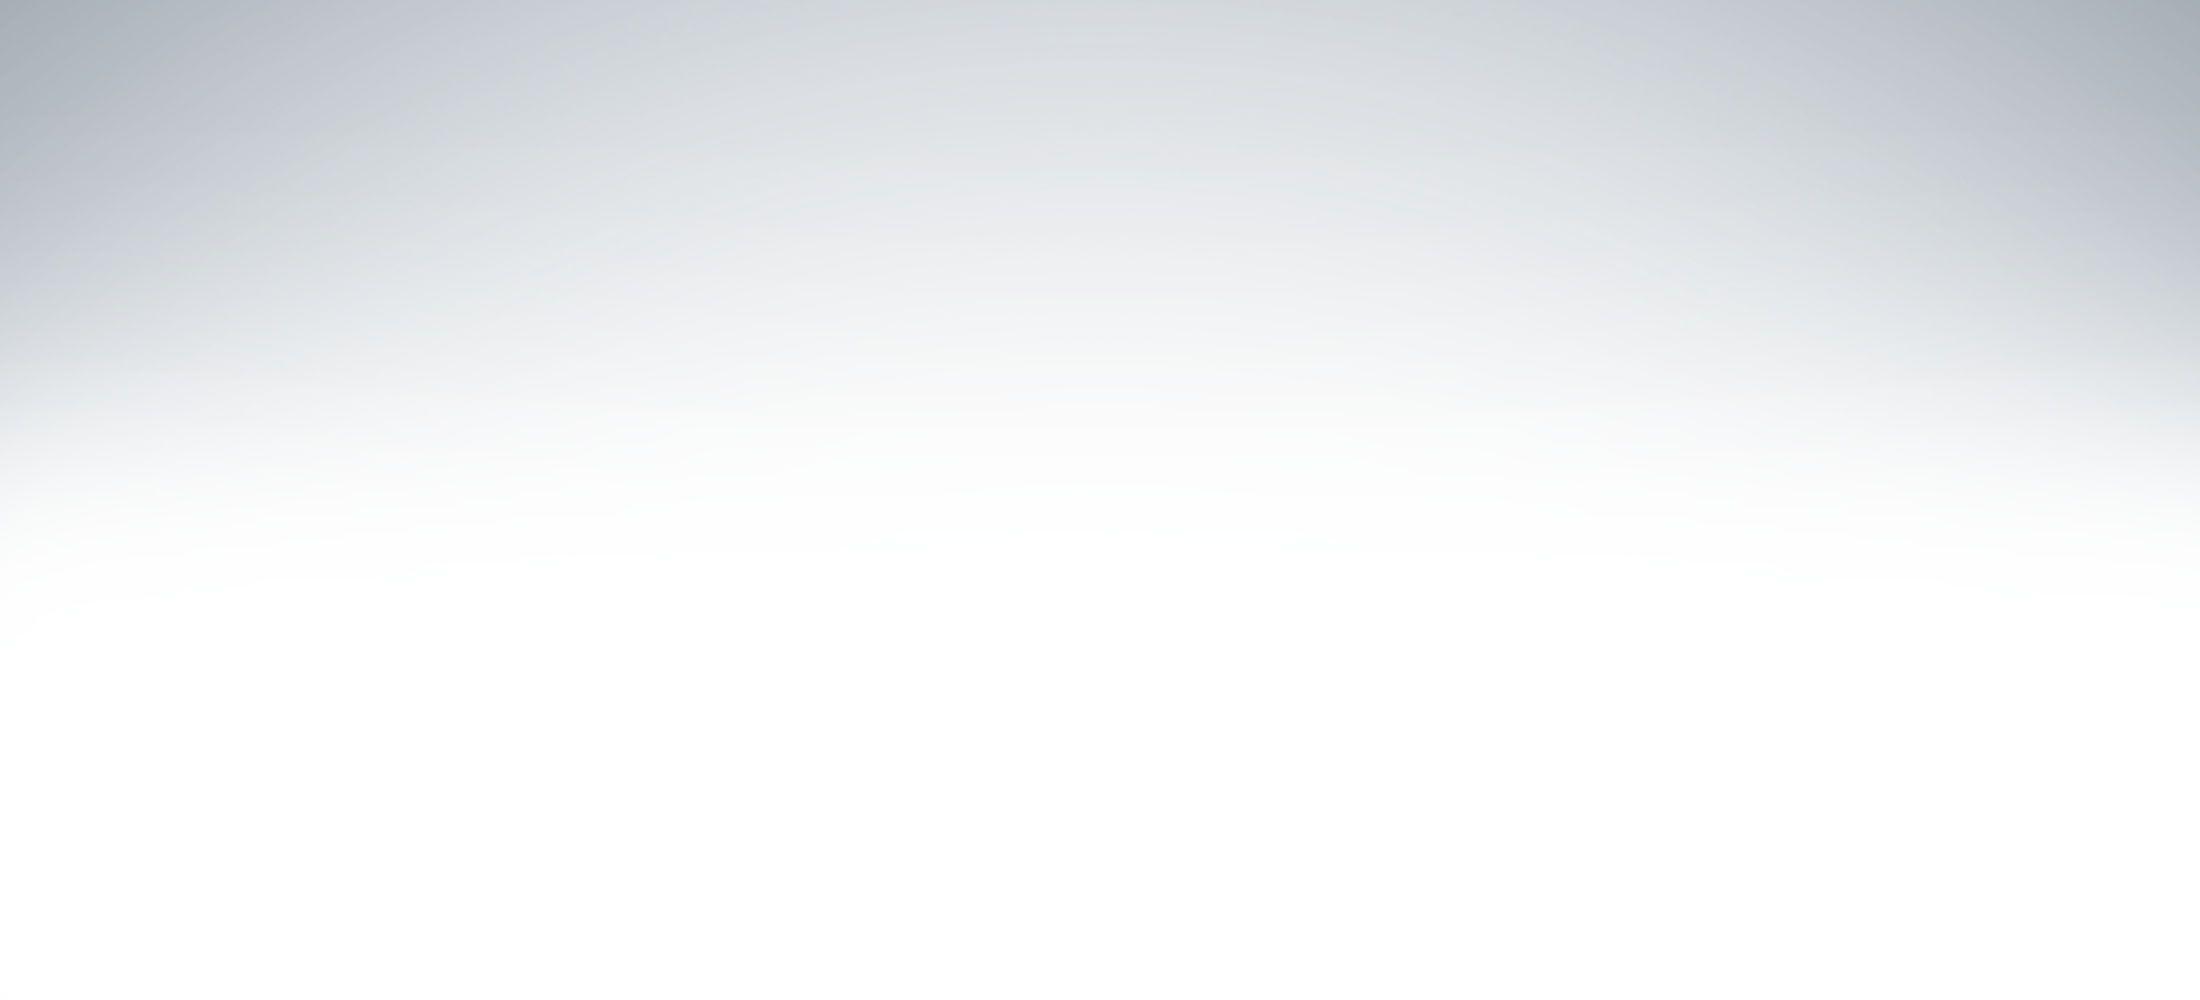 Grey Gradient Background Compressor